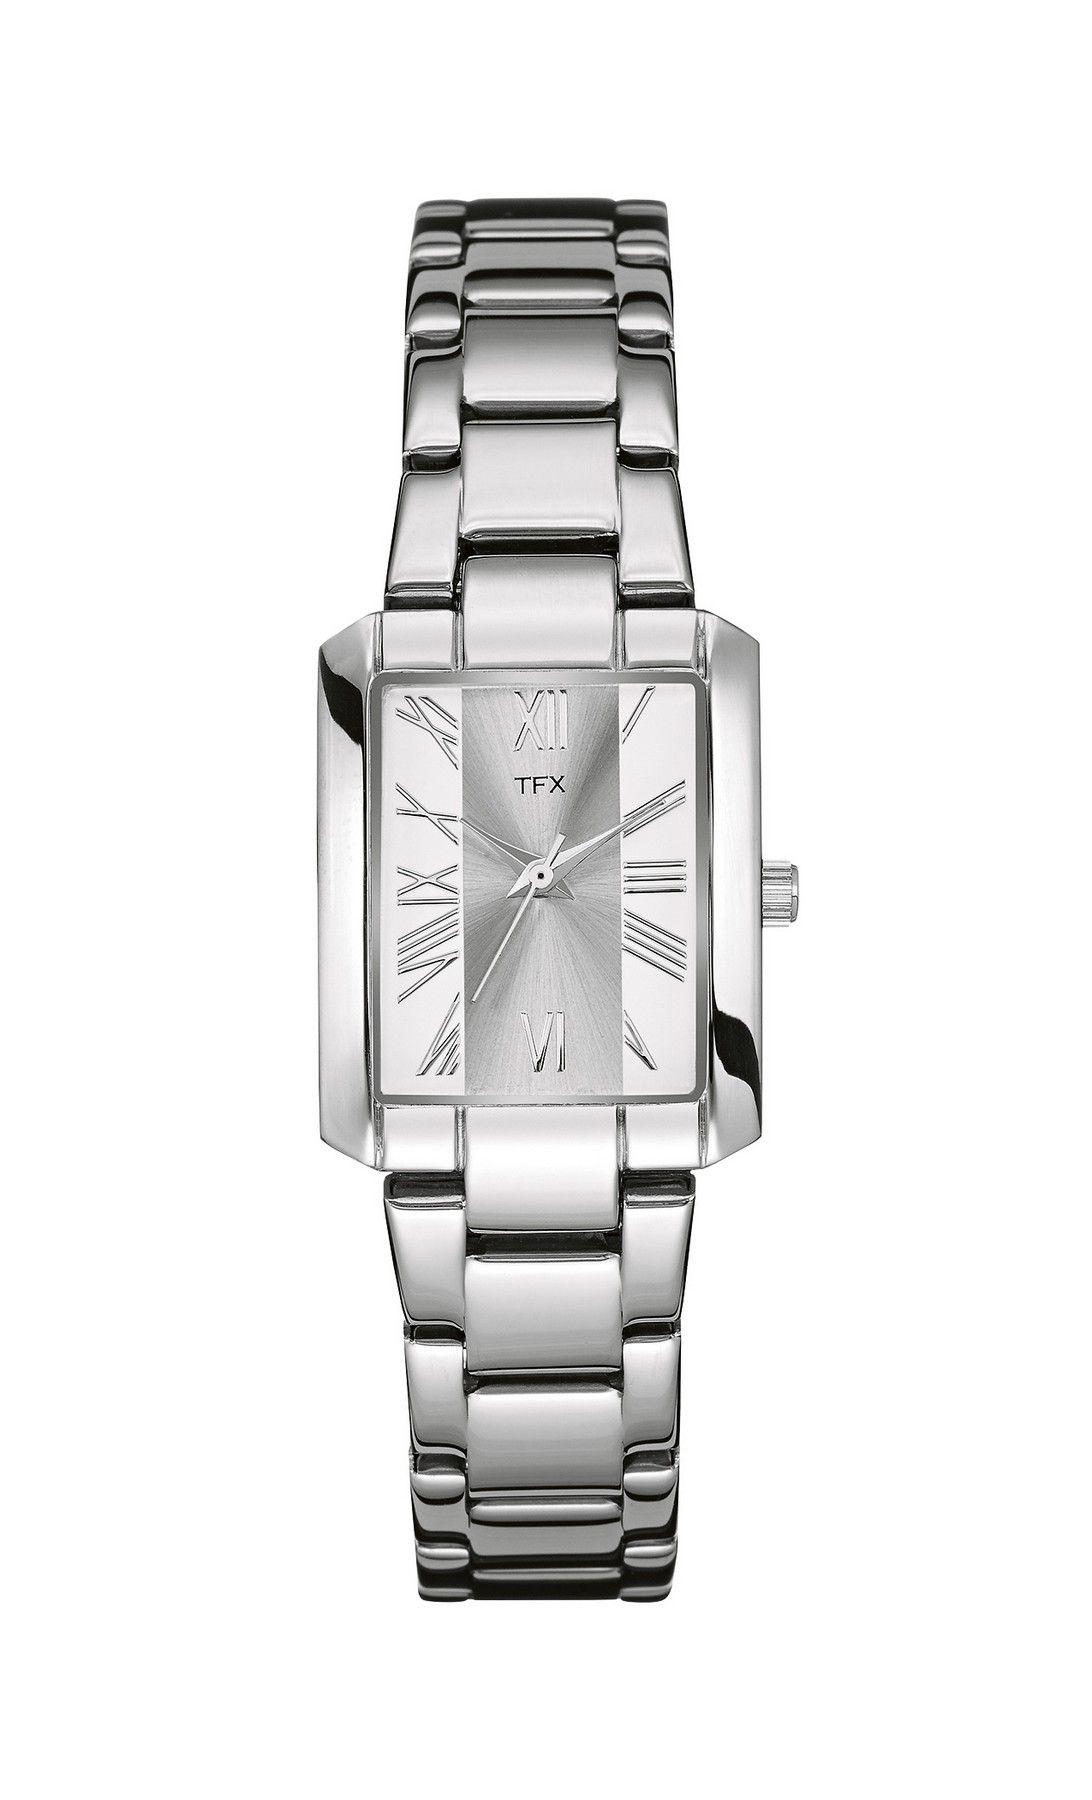 36T116 Bulova TFX Collection Ladies Tank Steel Bracelet Watch w/ Rectangle Dial